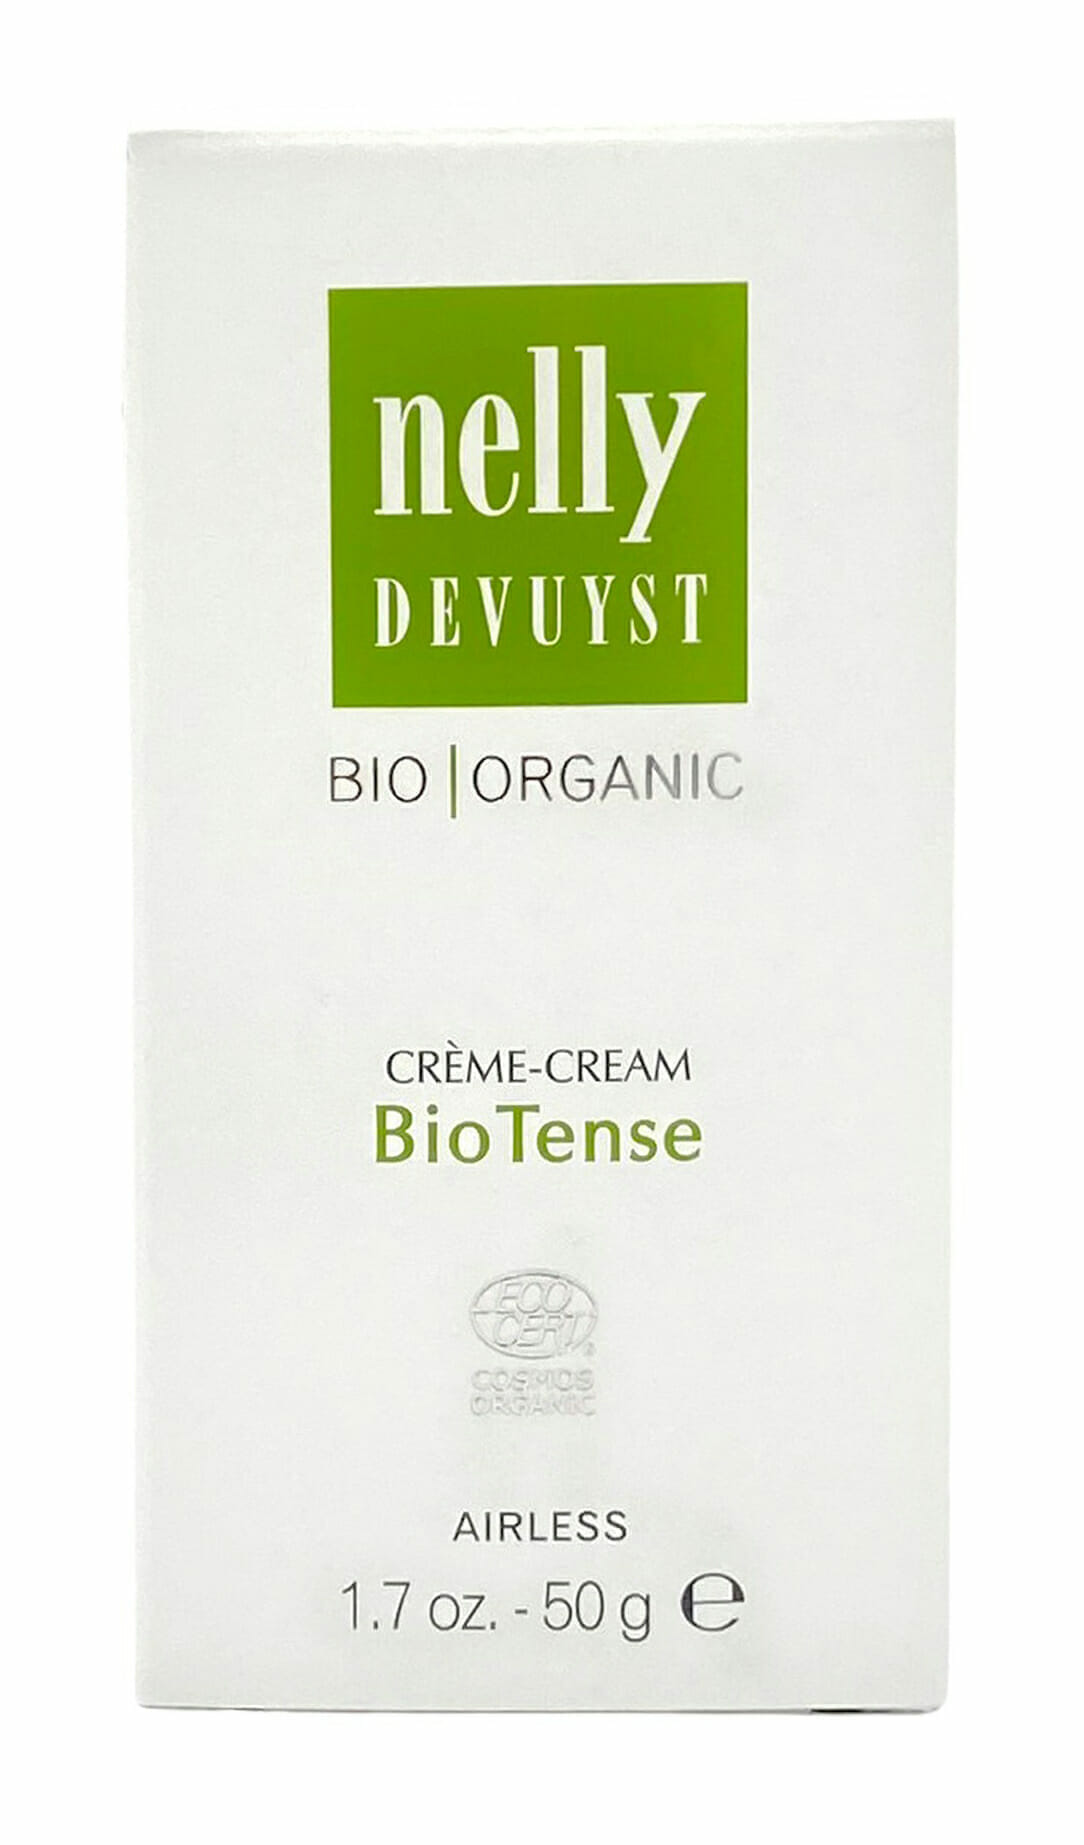 Nelly De Vuyst BioTense Cream